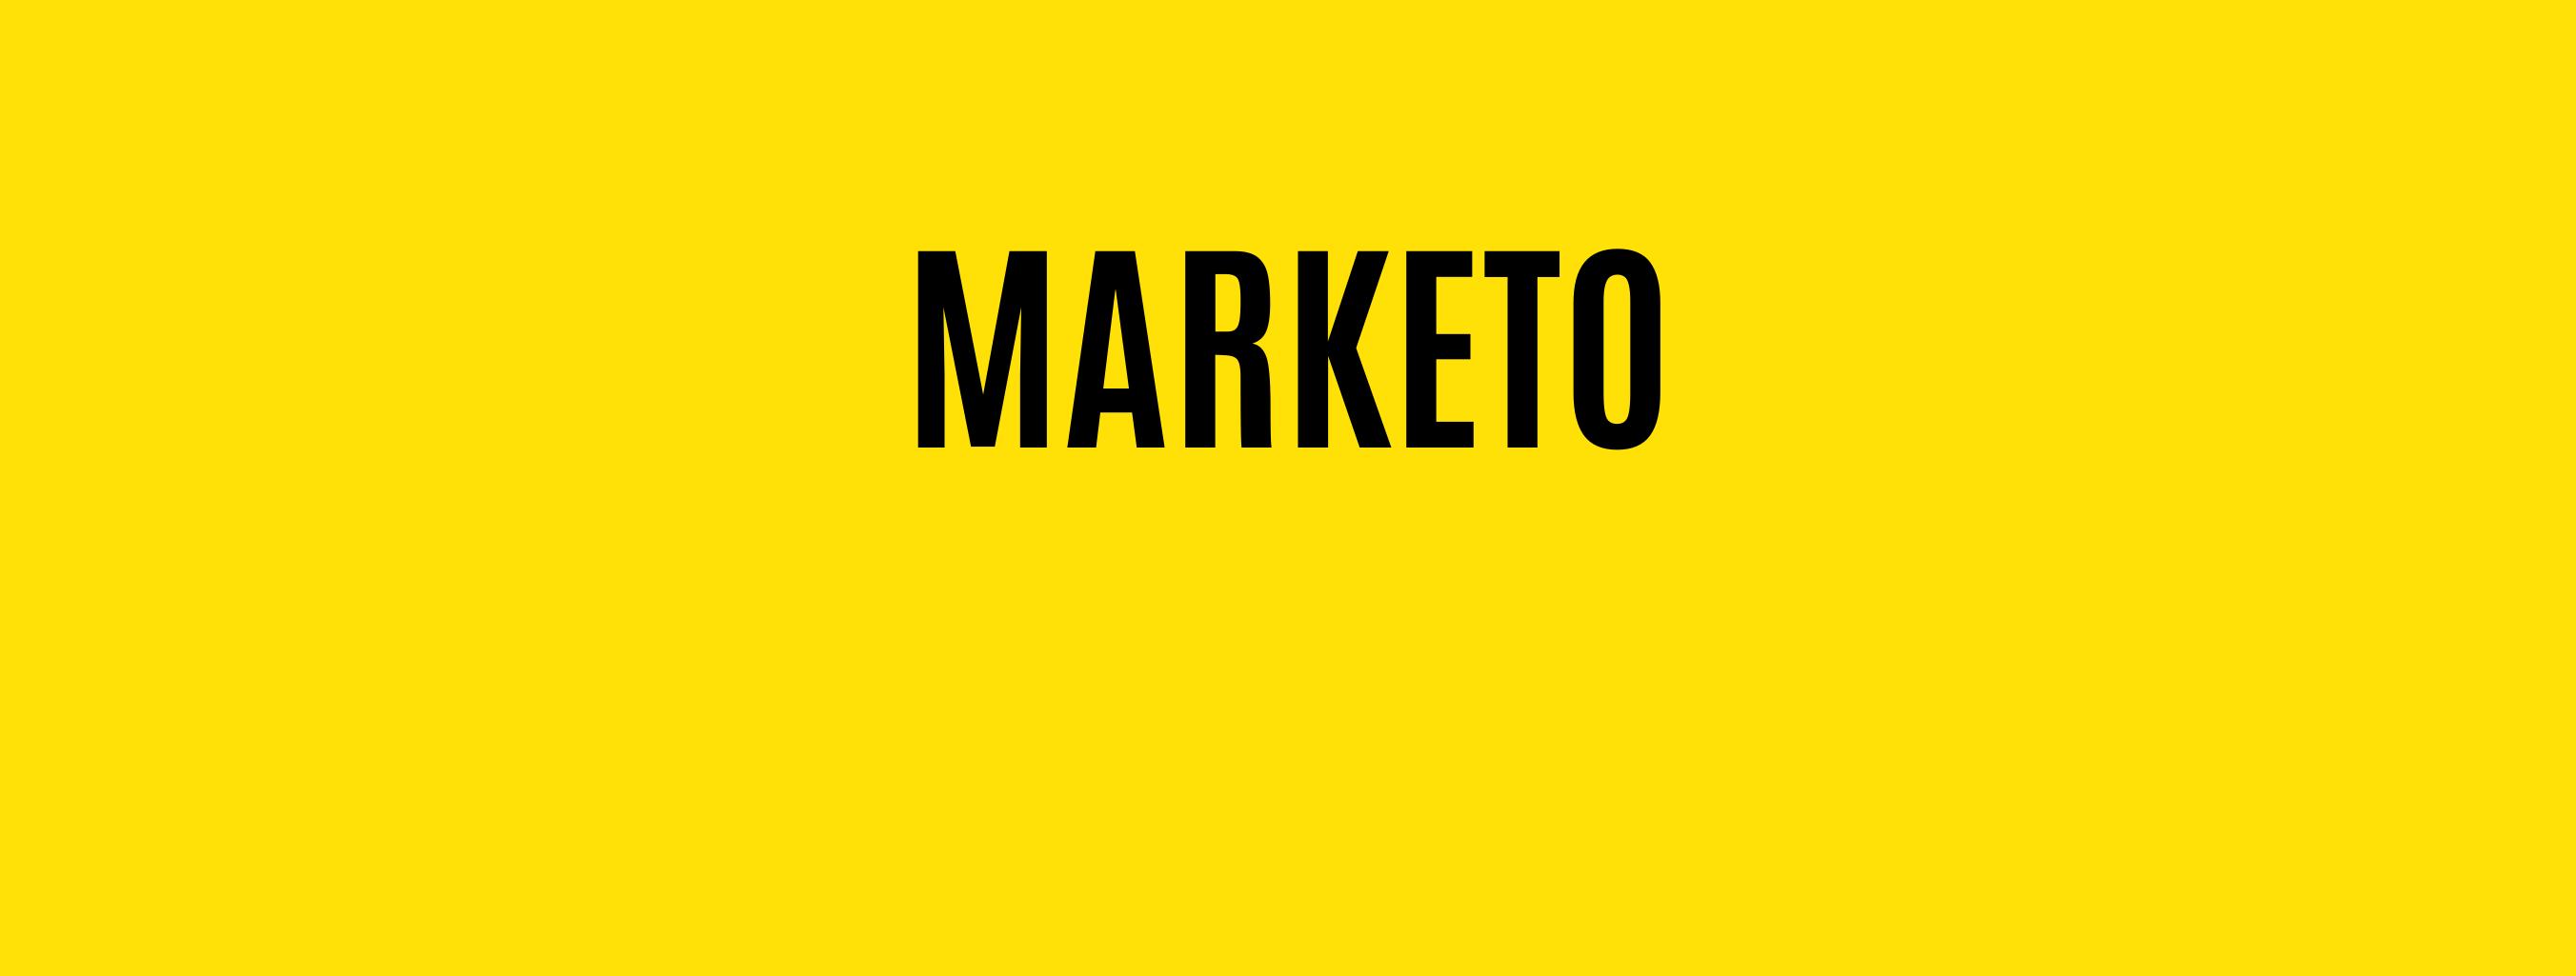 Marketo Marketing Specialists